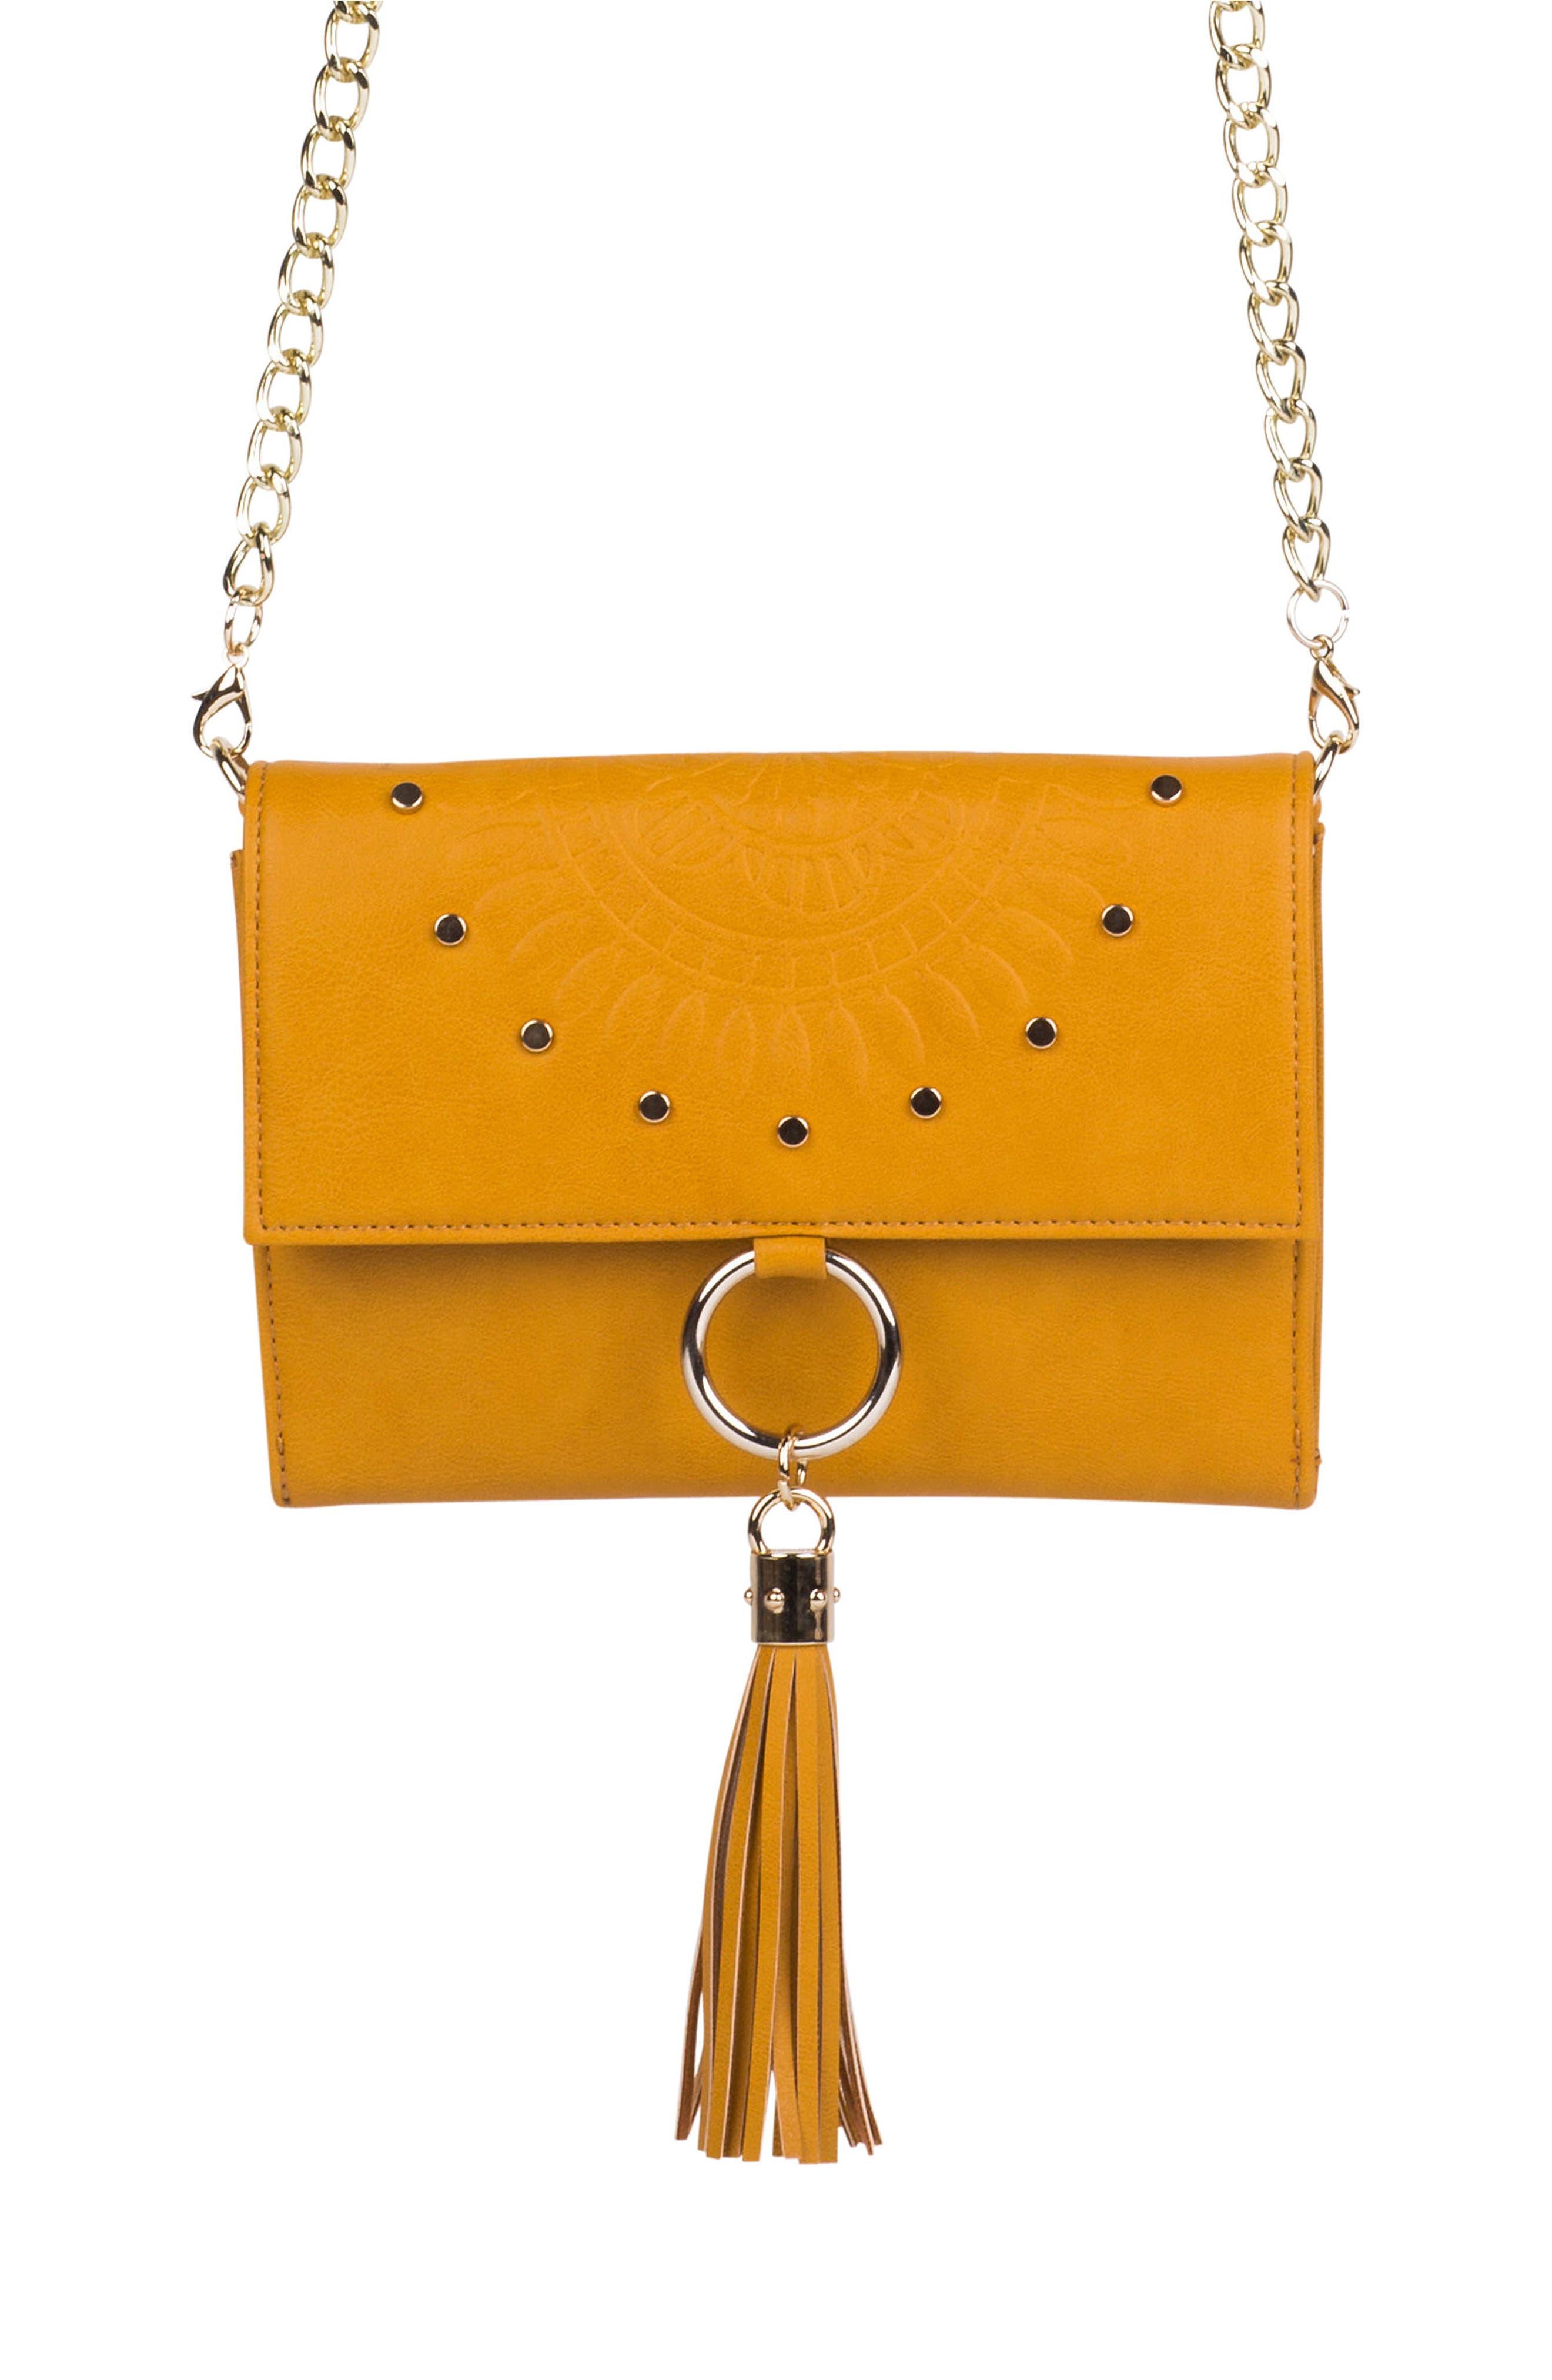 First Love Vegan Leather Crossbody Bag - Yellow in Mustard